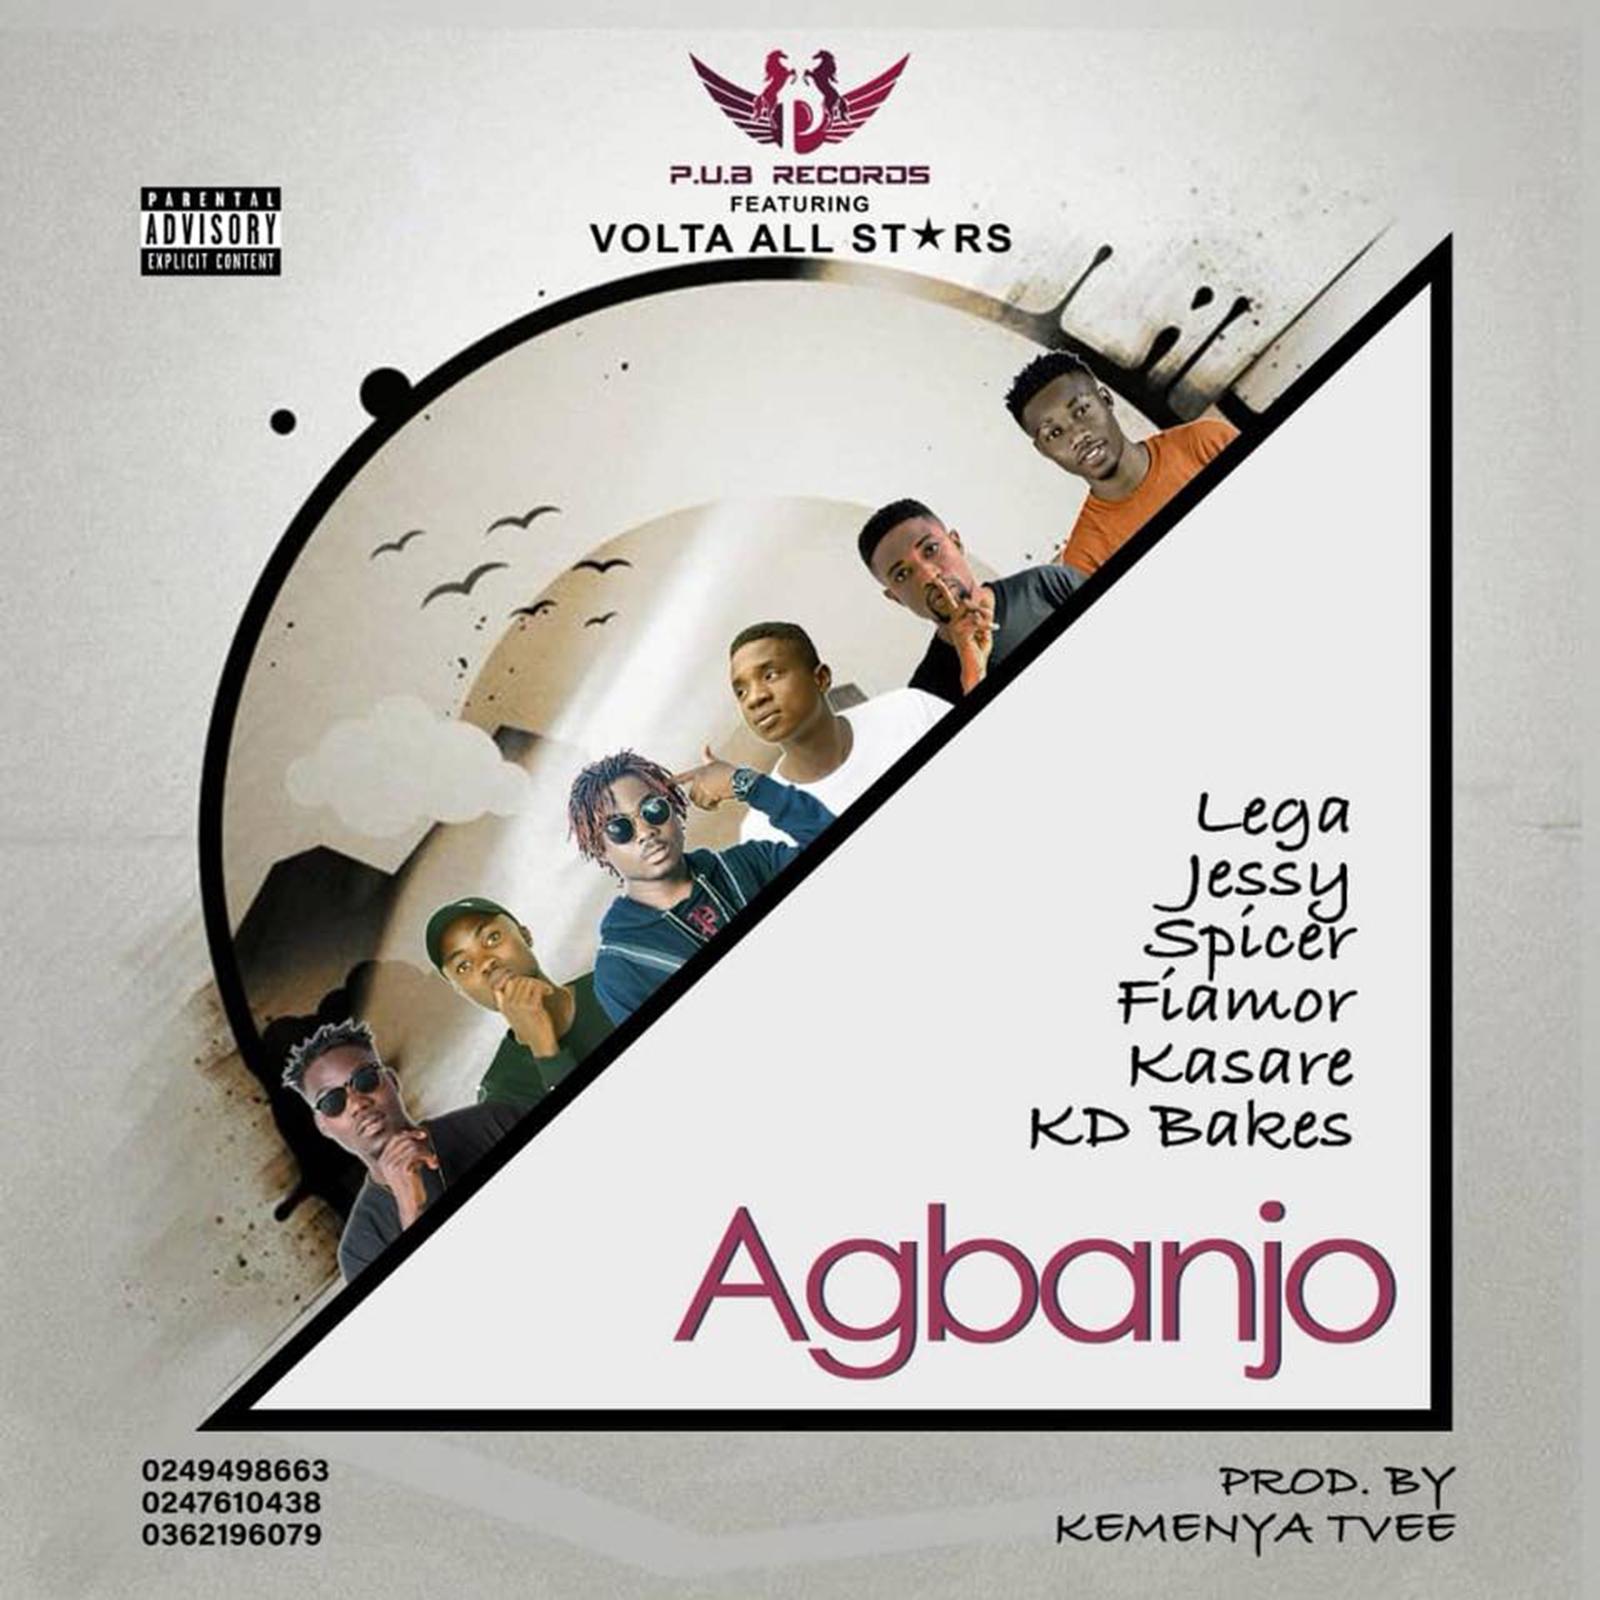 Agbanjo by Lega, Jessy, Spicer, Fiamore, Kasare & KD Bakes